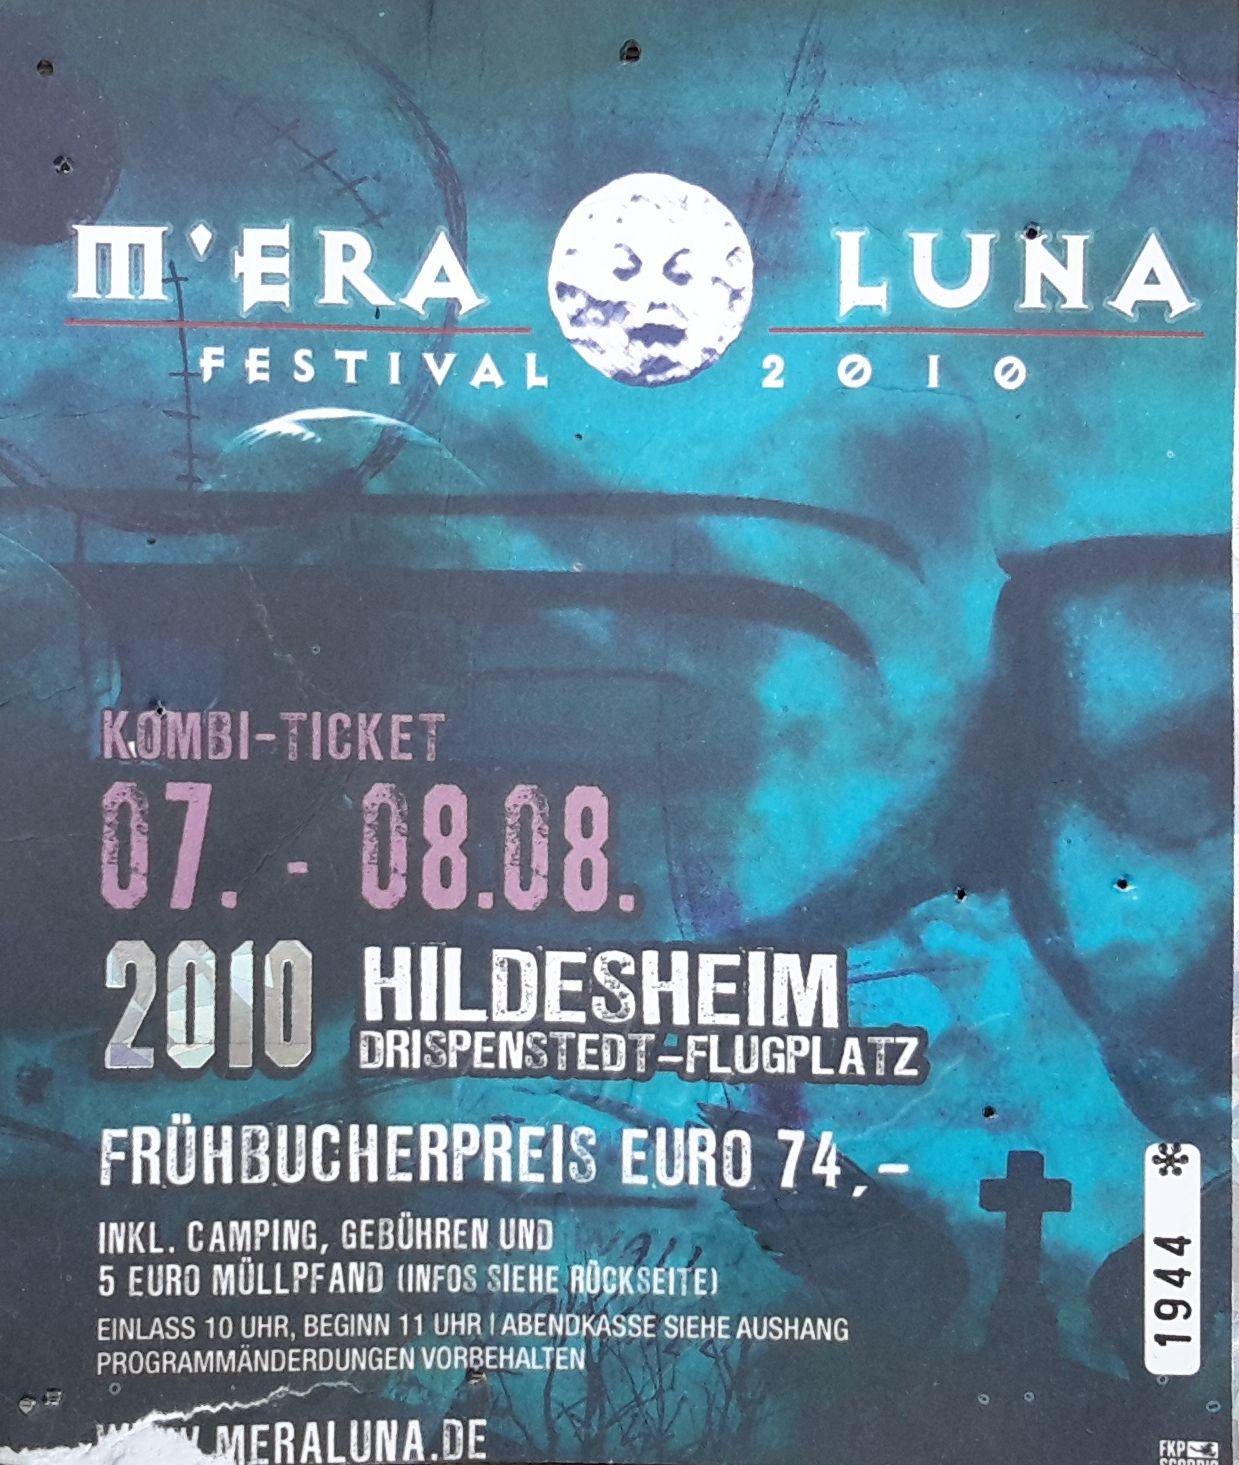 Mera Luna Festival 2010 - Flugplatz, Hildesheim am 06.08